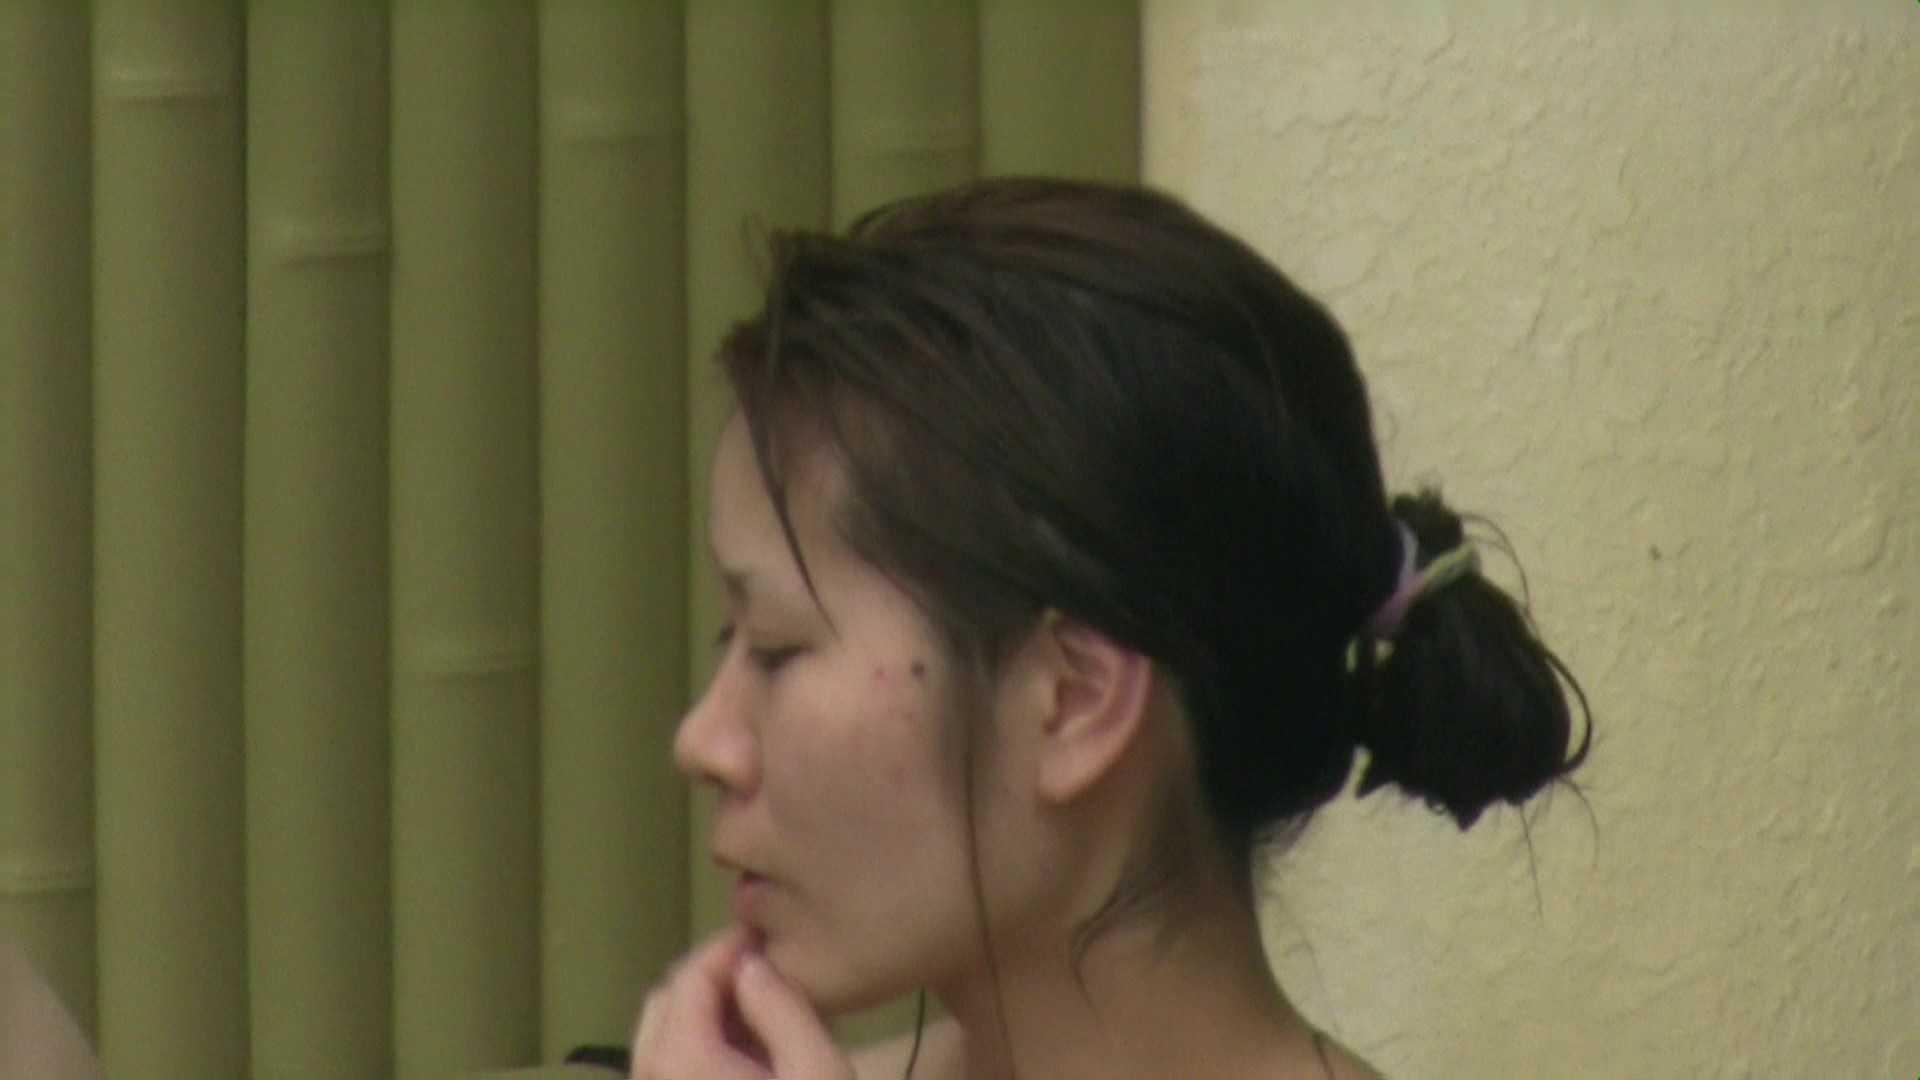 Aquaな露天風呂Vol.07 露天風呂 エロ無料画像 111連発 89